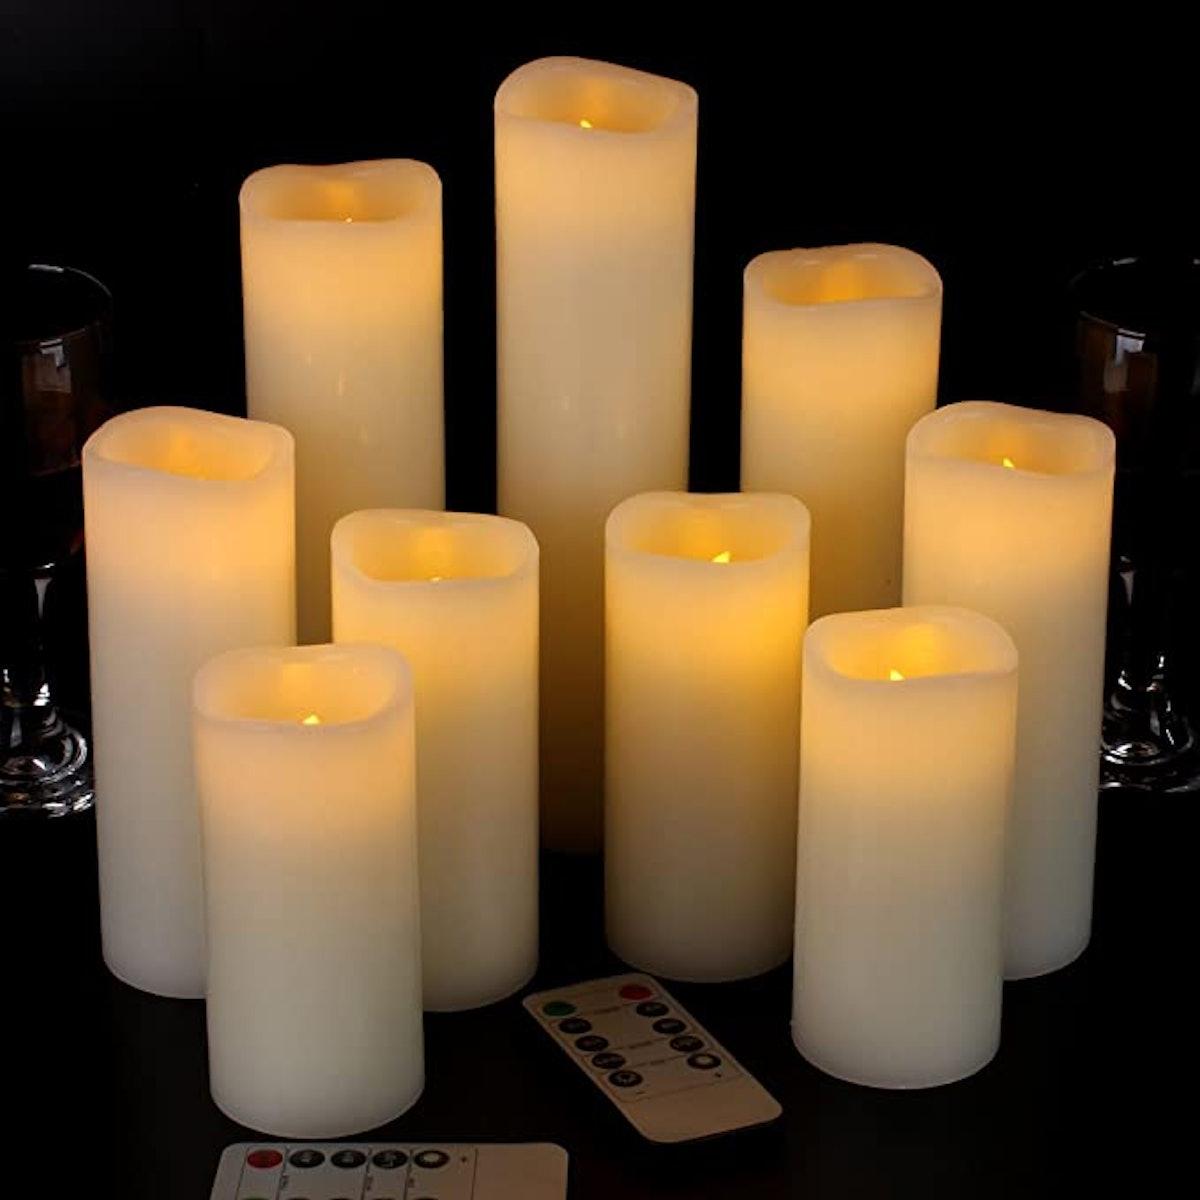 Vinkor Flameless Candles